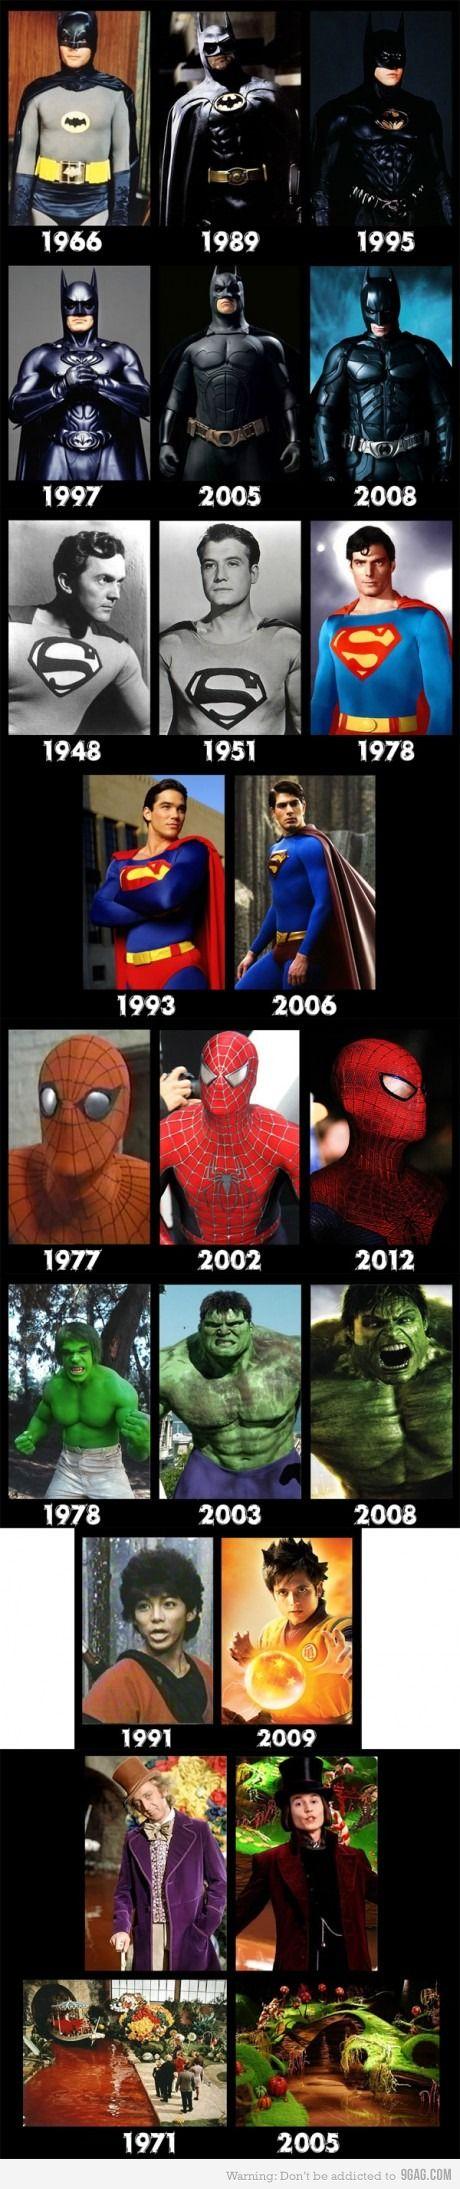 The Evolution of Batman, Superman, Spider-man, Hulk, ... Dragon Ball Z and Willy Wonka?